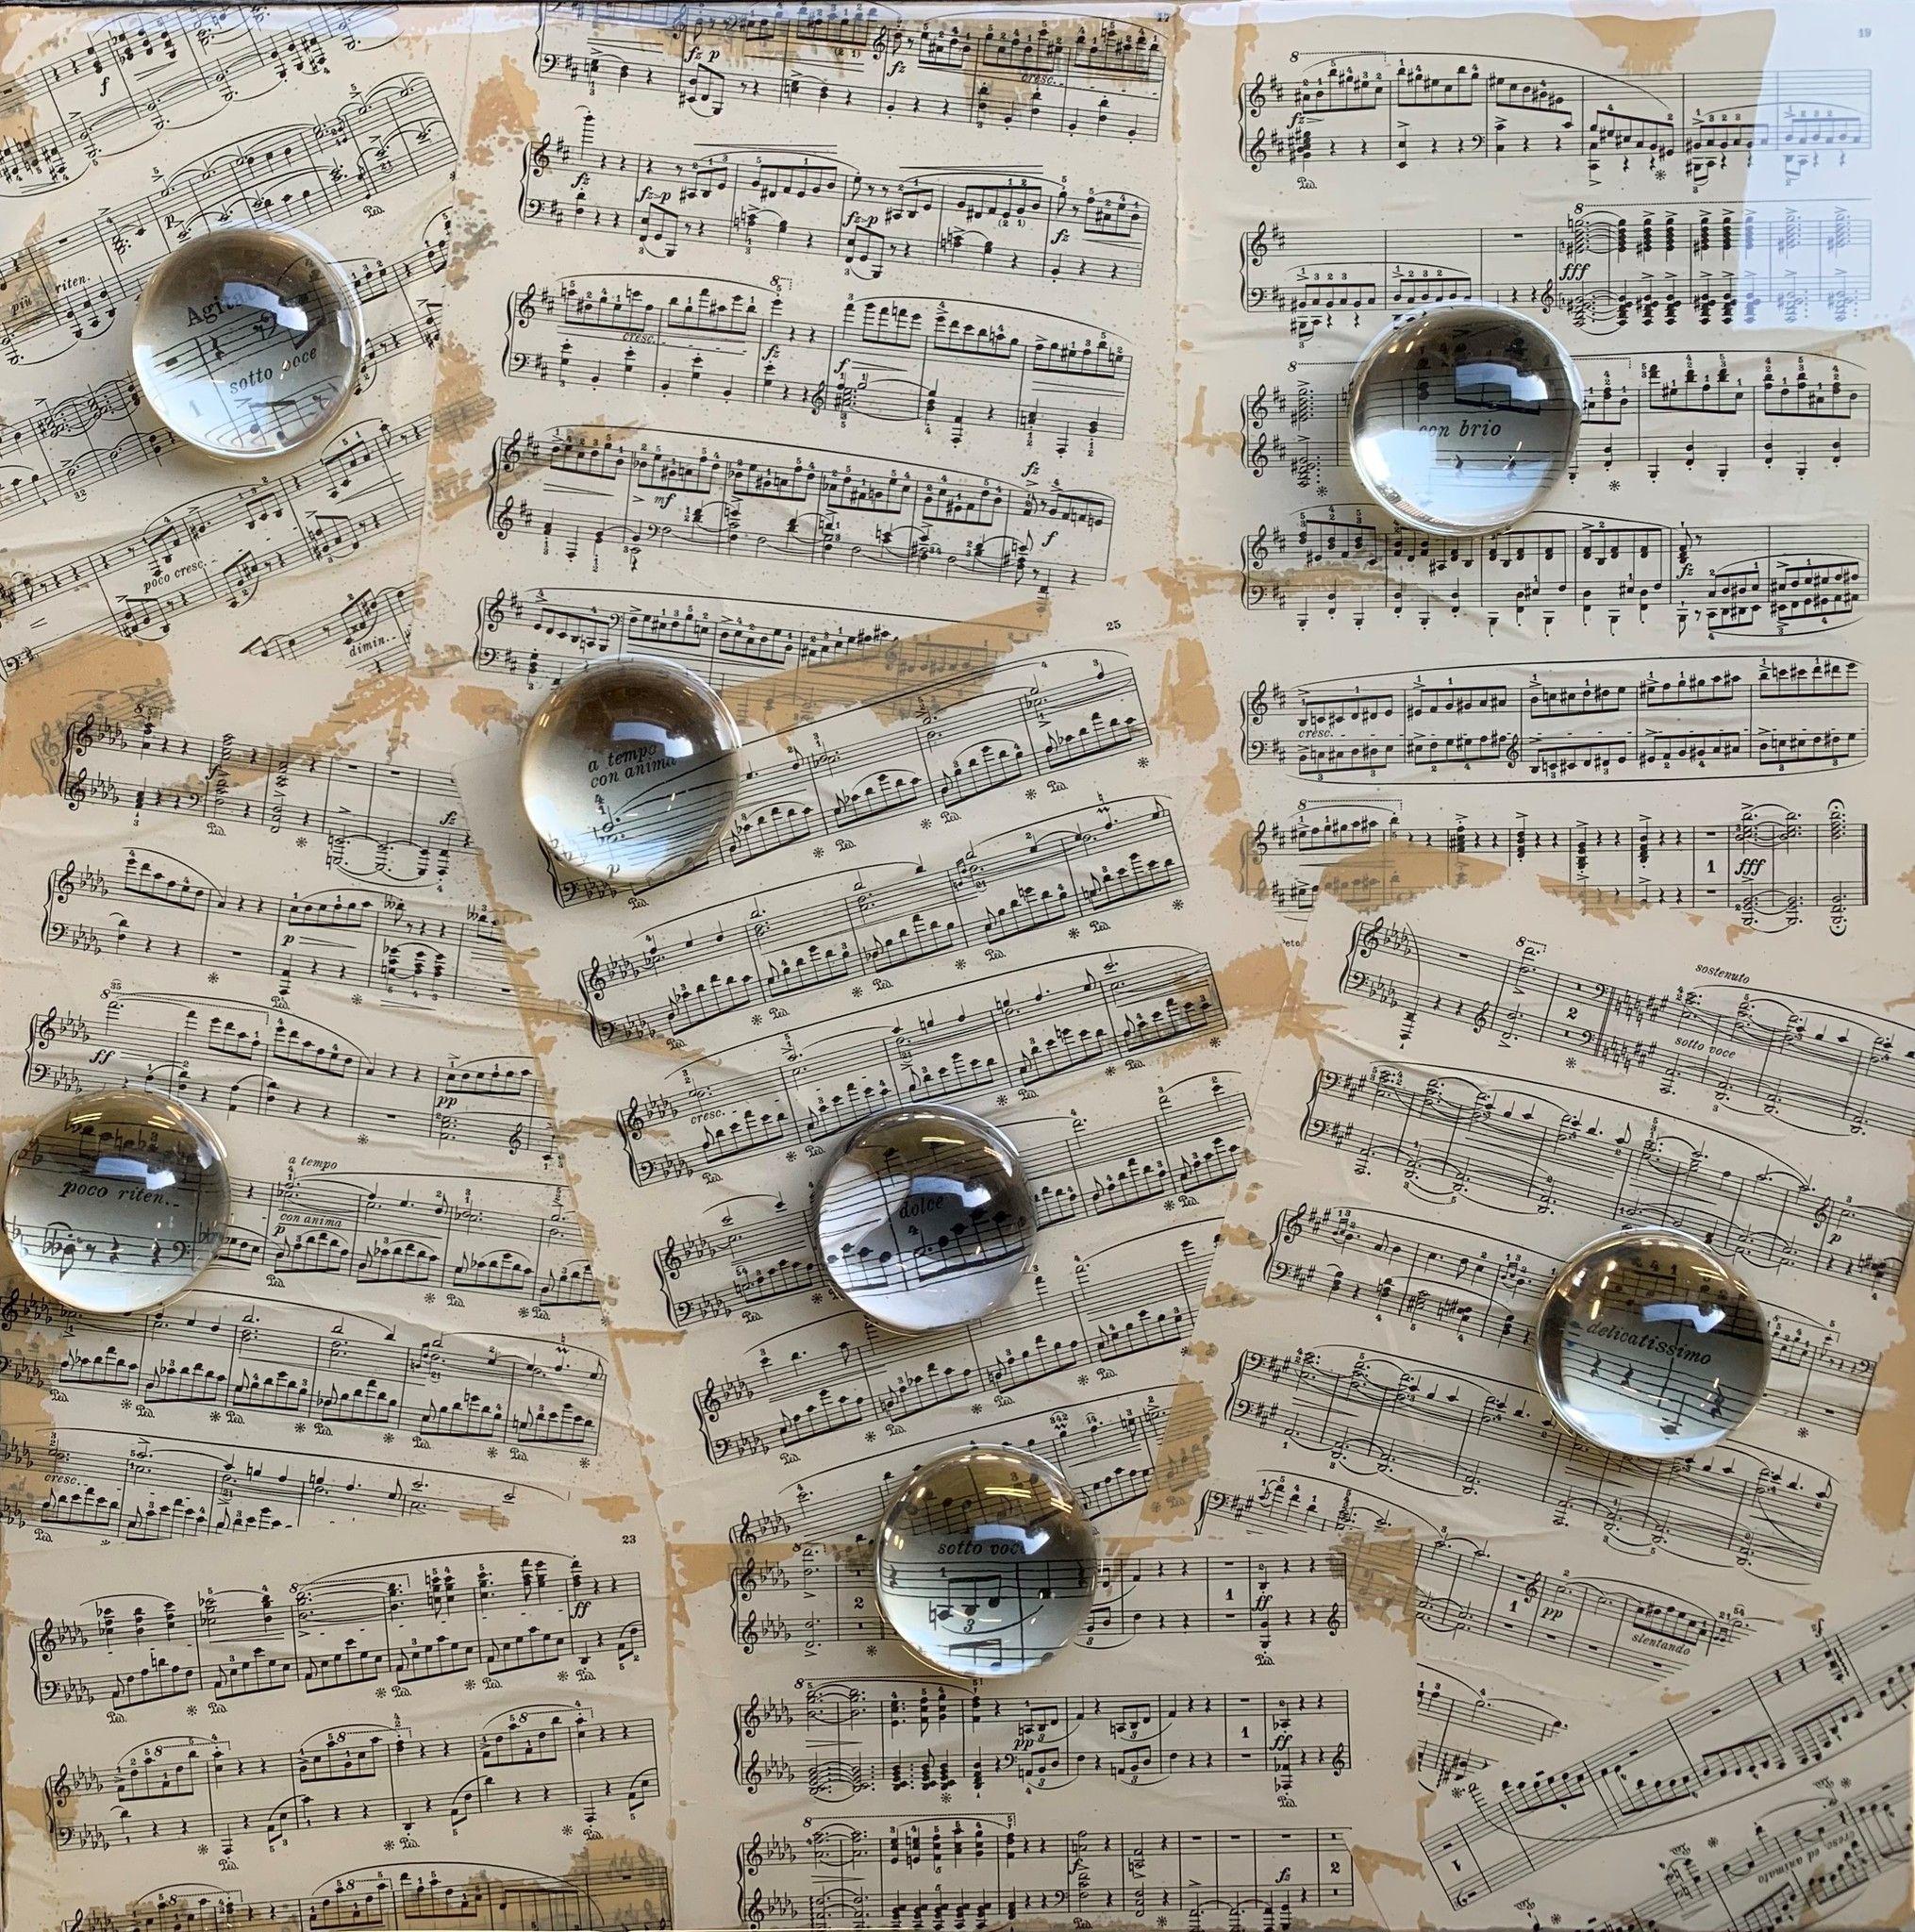 RESINE SU TAVOLA GIUSEPPE PORTELLA ' MUSICA E LUCE '  dimensioni L 60 x H 60 cm.